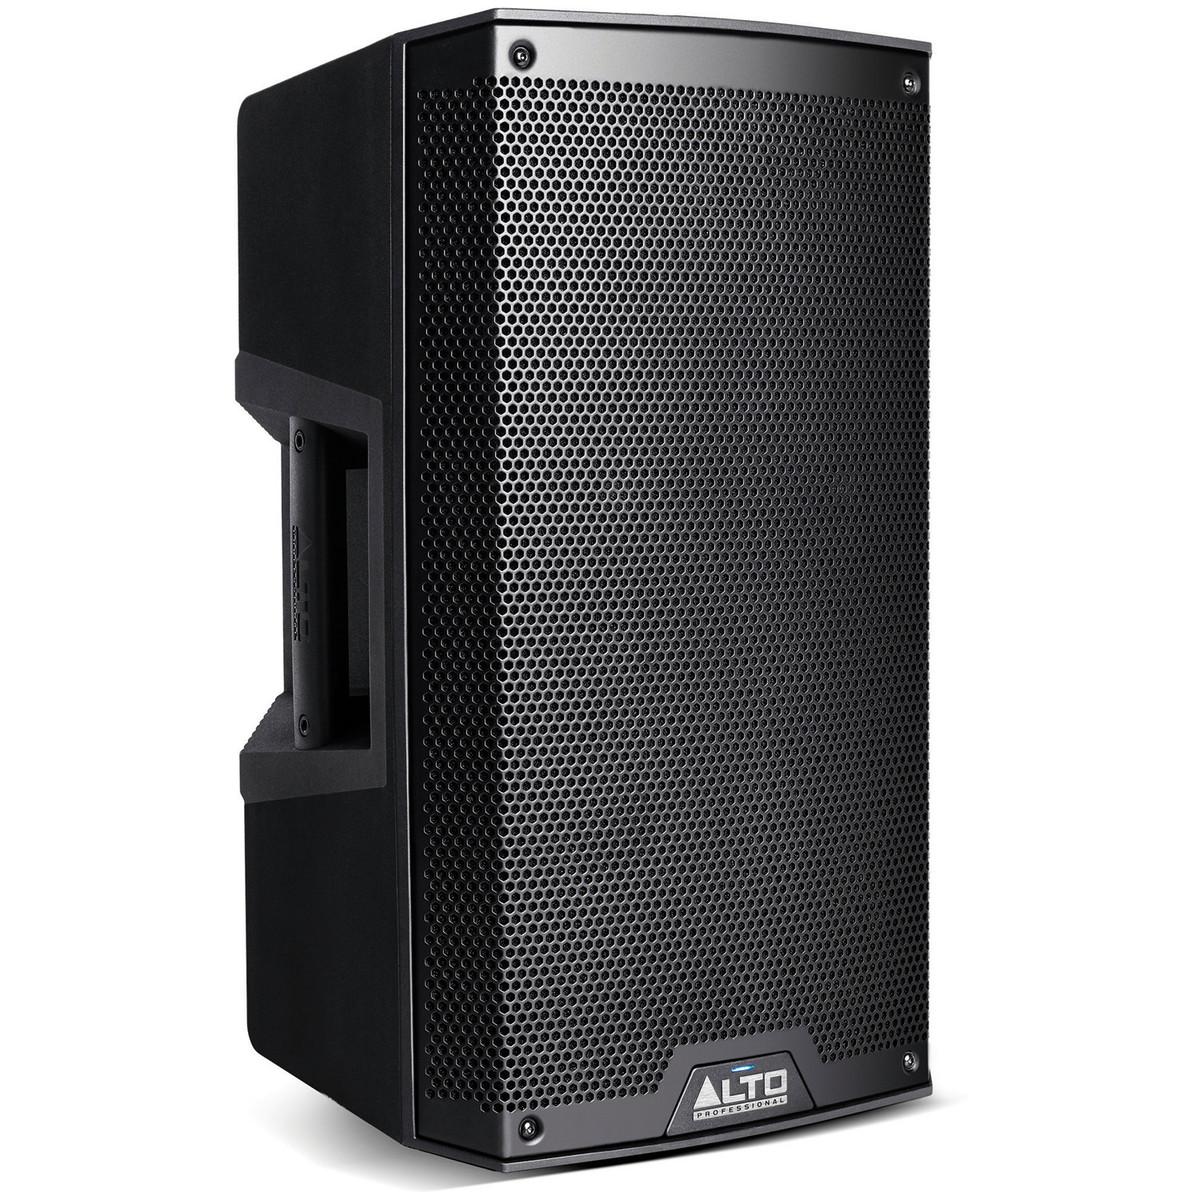 Alto Ts 210 : alto truesonic ts210 10 active pa speaker at gear4music ~ Vivirlamusica.com Haus und Dekorationen